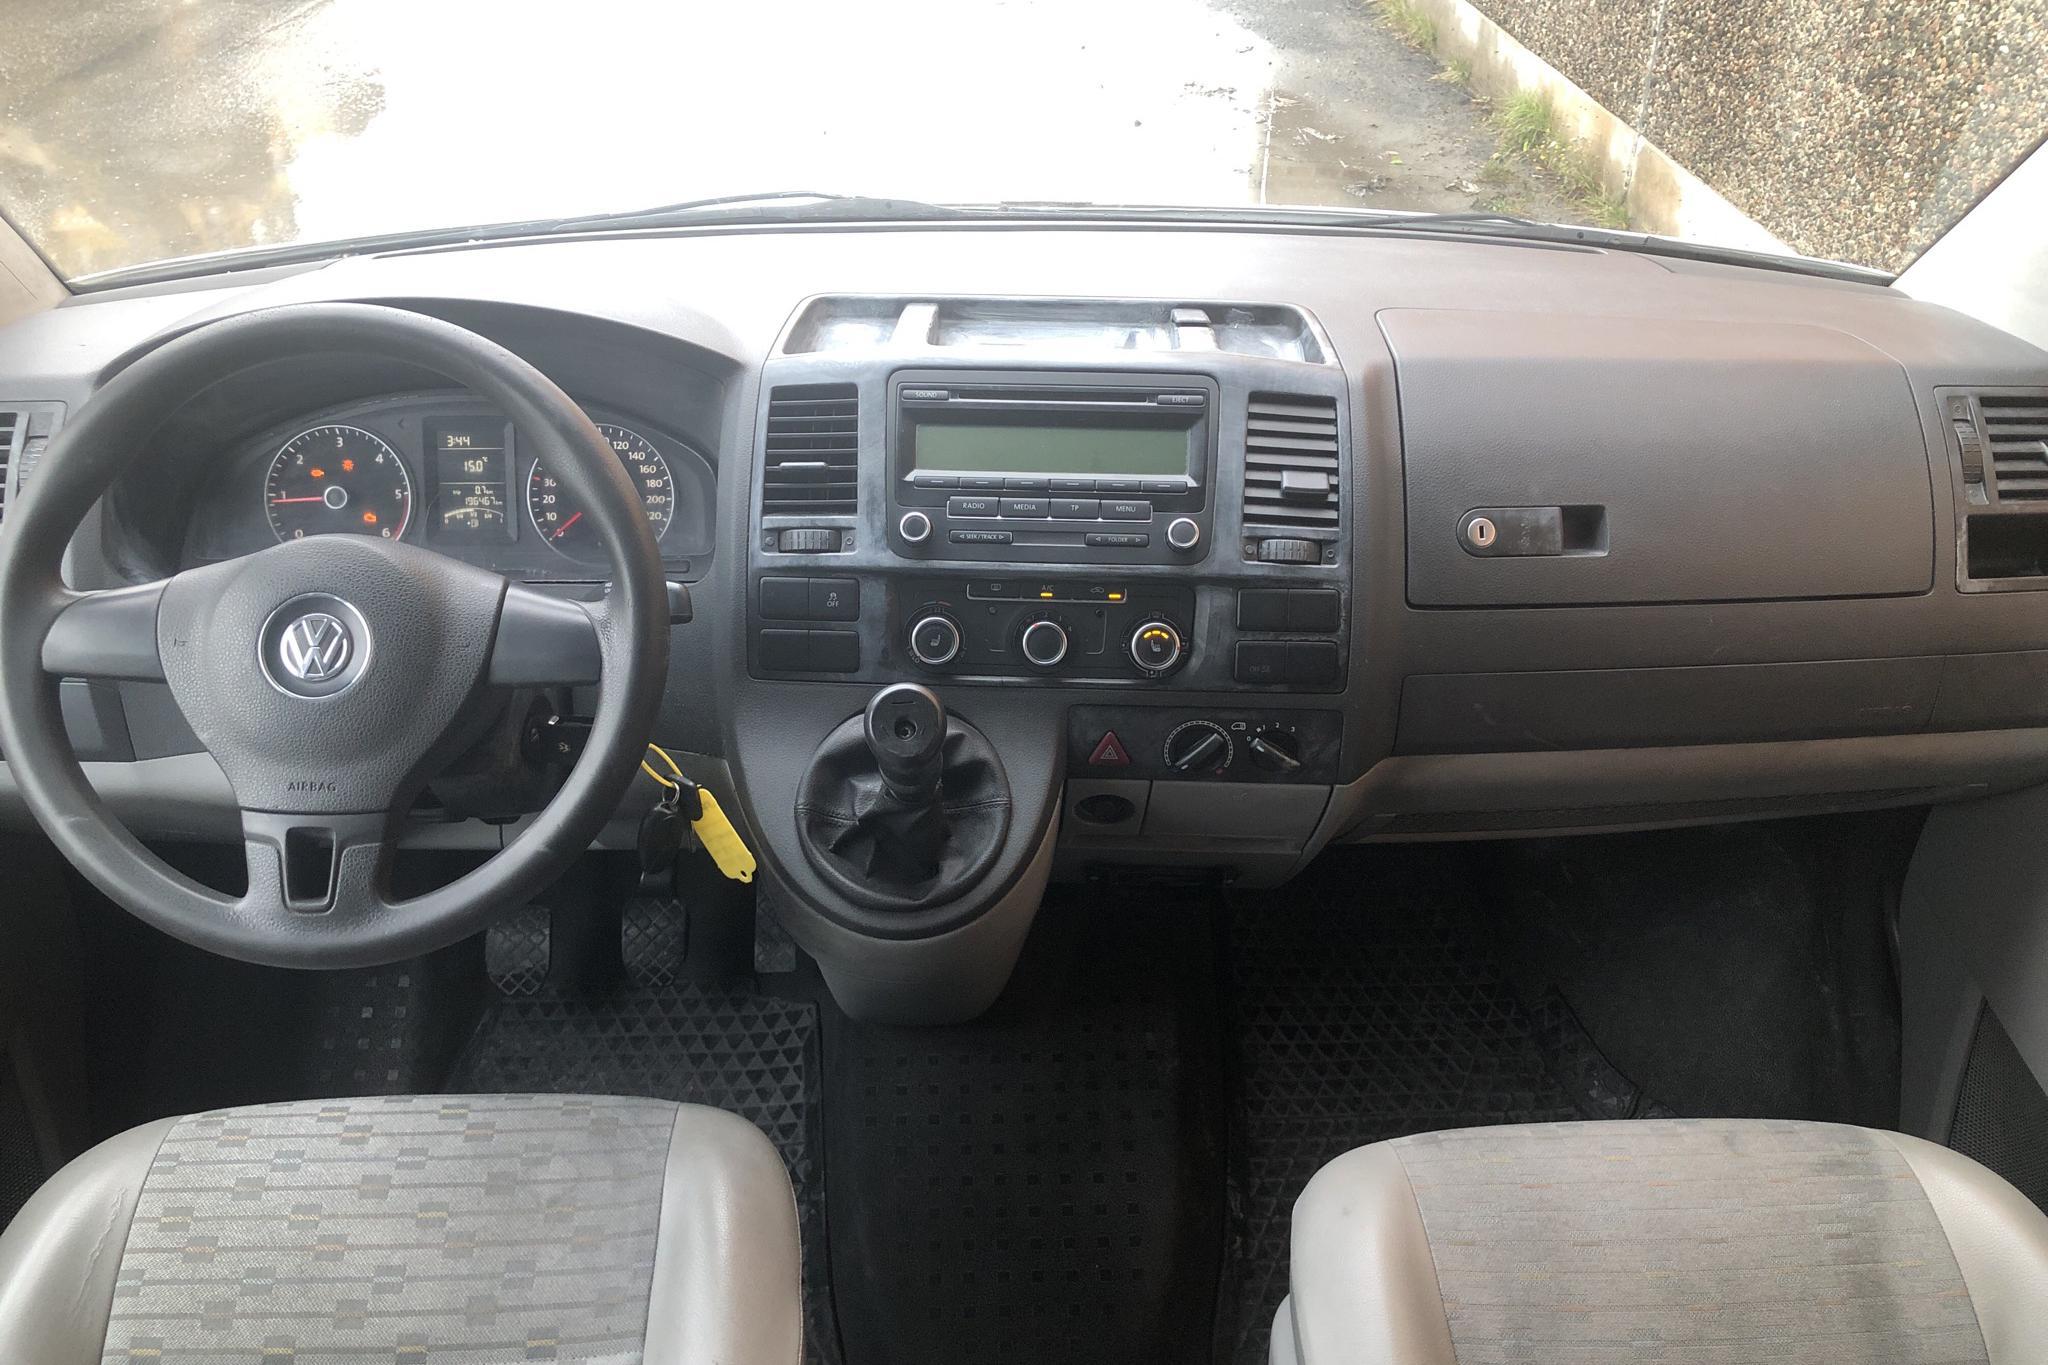 VW Transporter T5 2.0 TDI Pickup (140hk) - 196 460 km - Manual - white - 2011